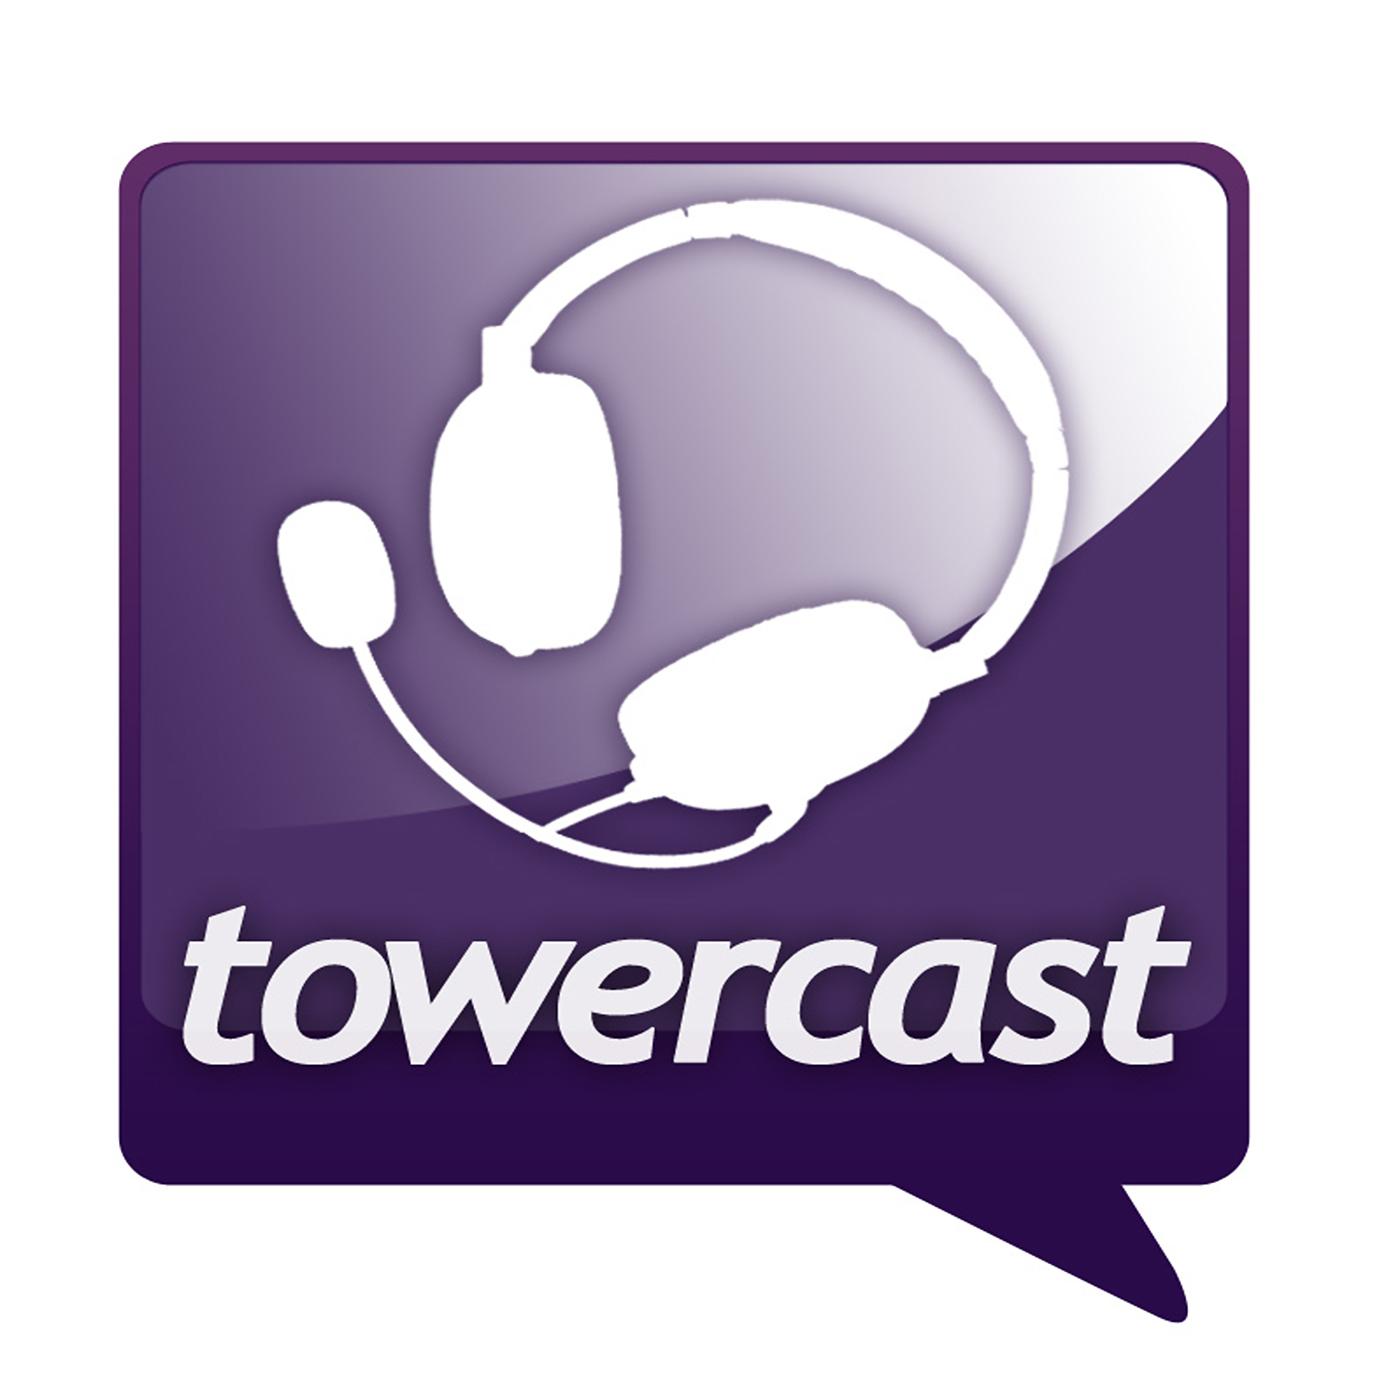 <![CDATA[TowerCast]]>